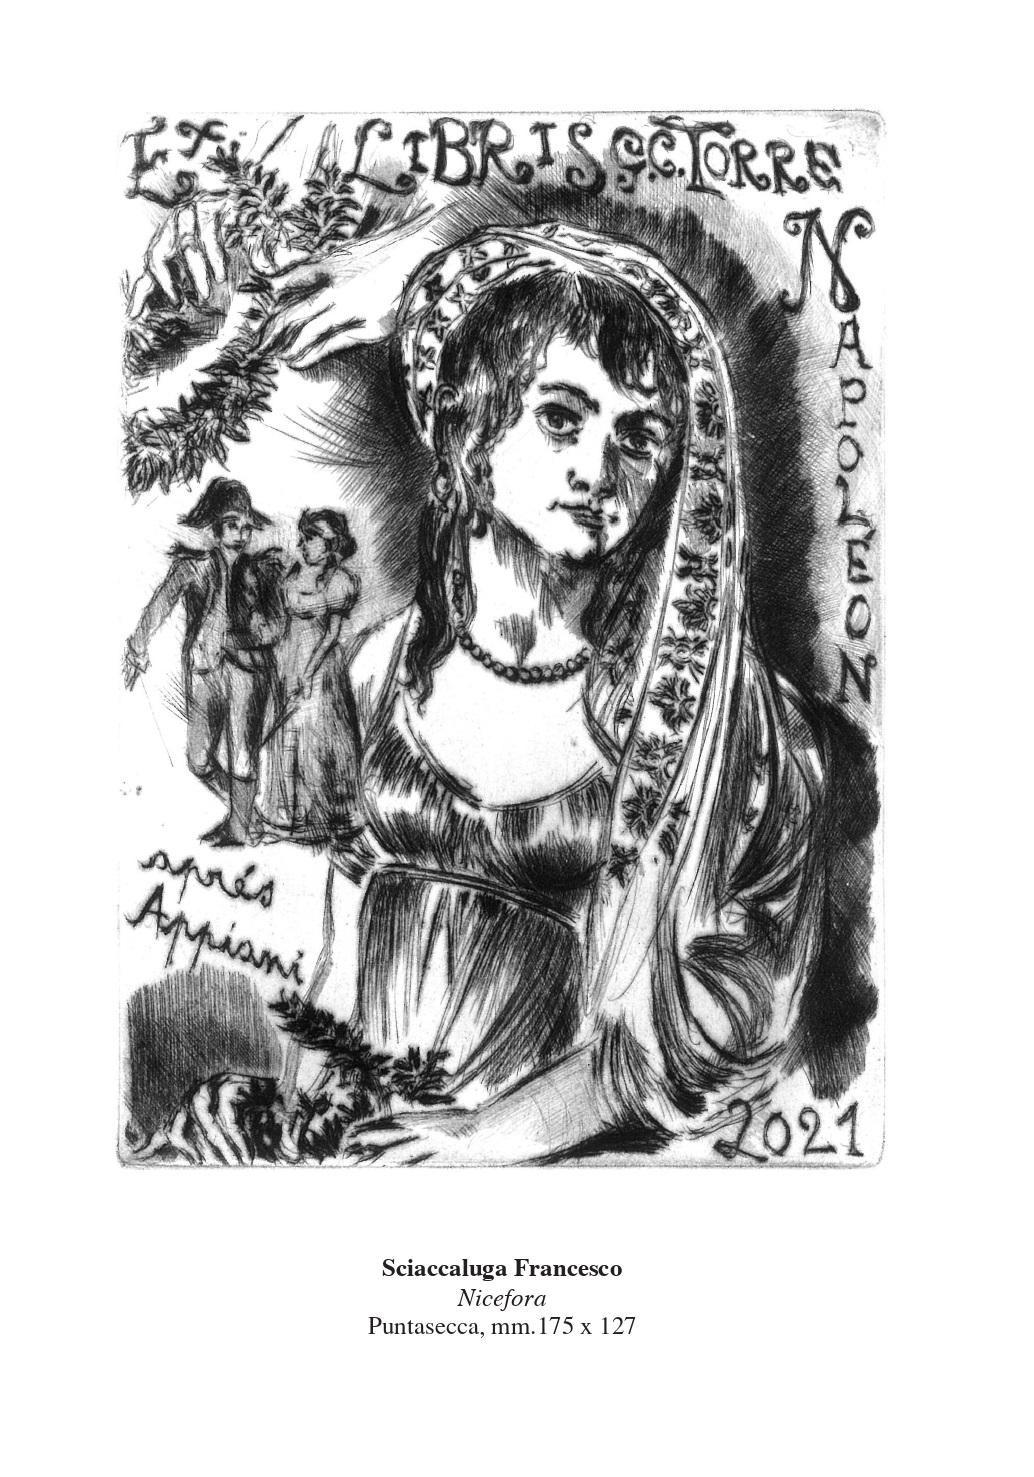 CATALOGO exlibris 2021-131_page-0001